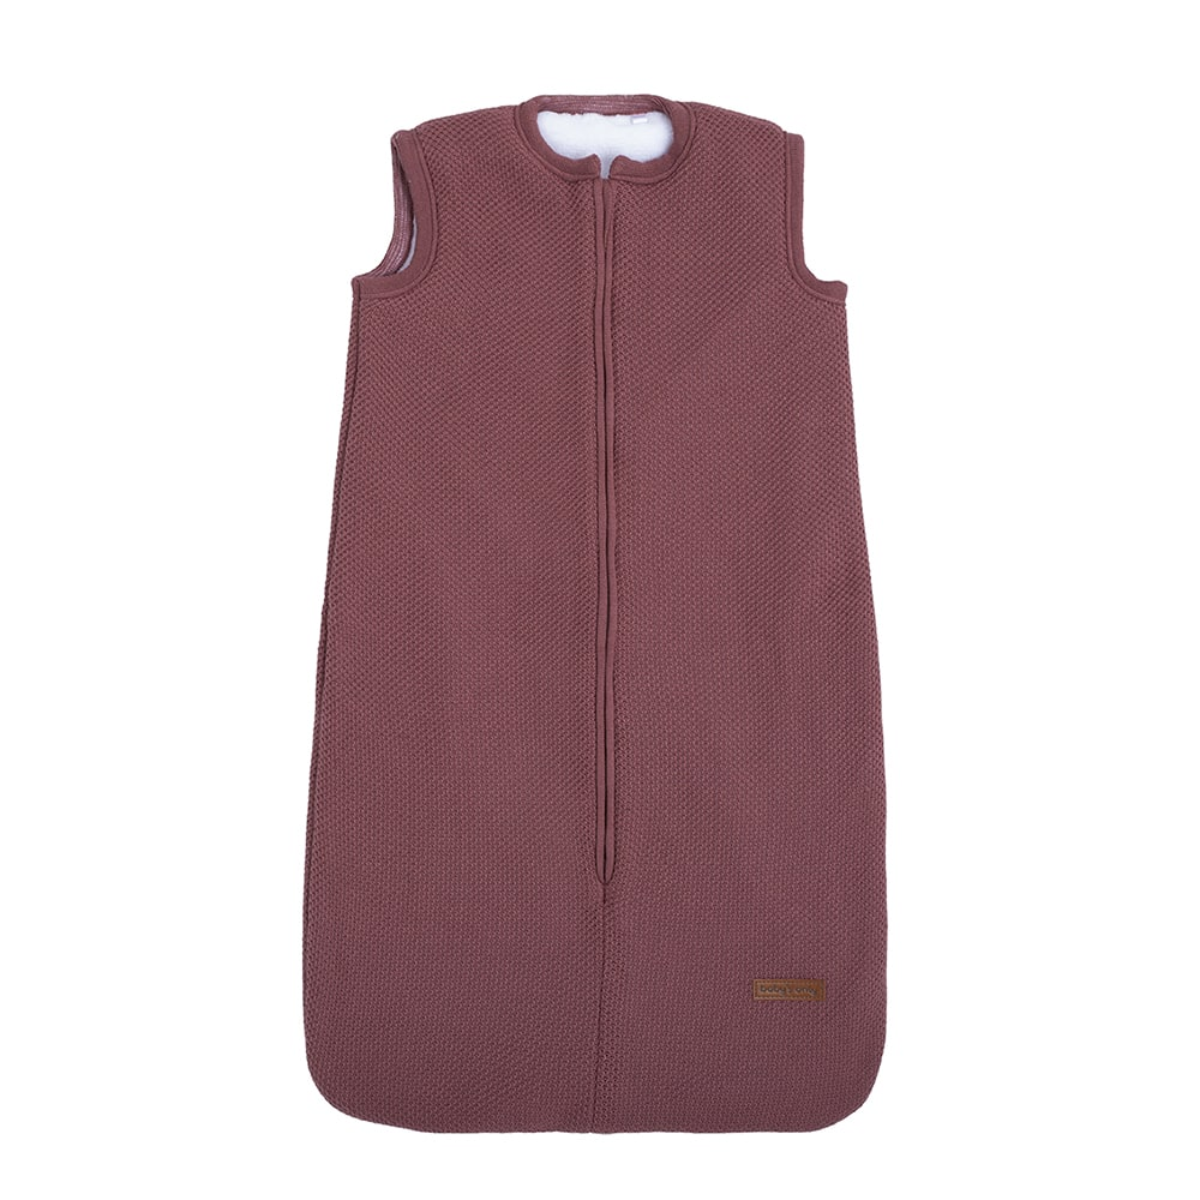 sleeping bag teddy classic stone red 70 cm